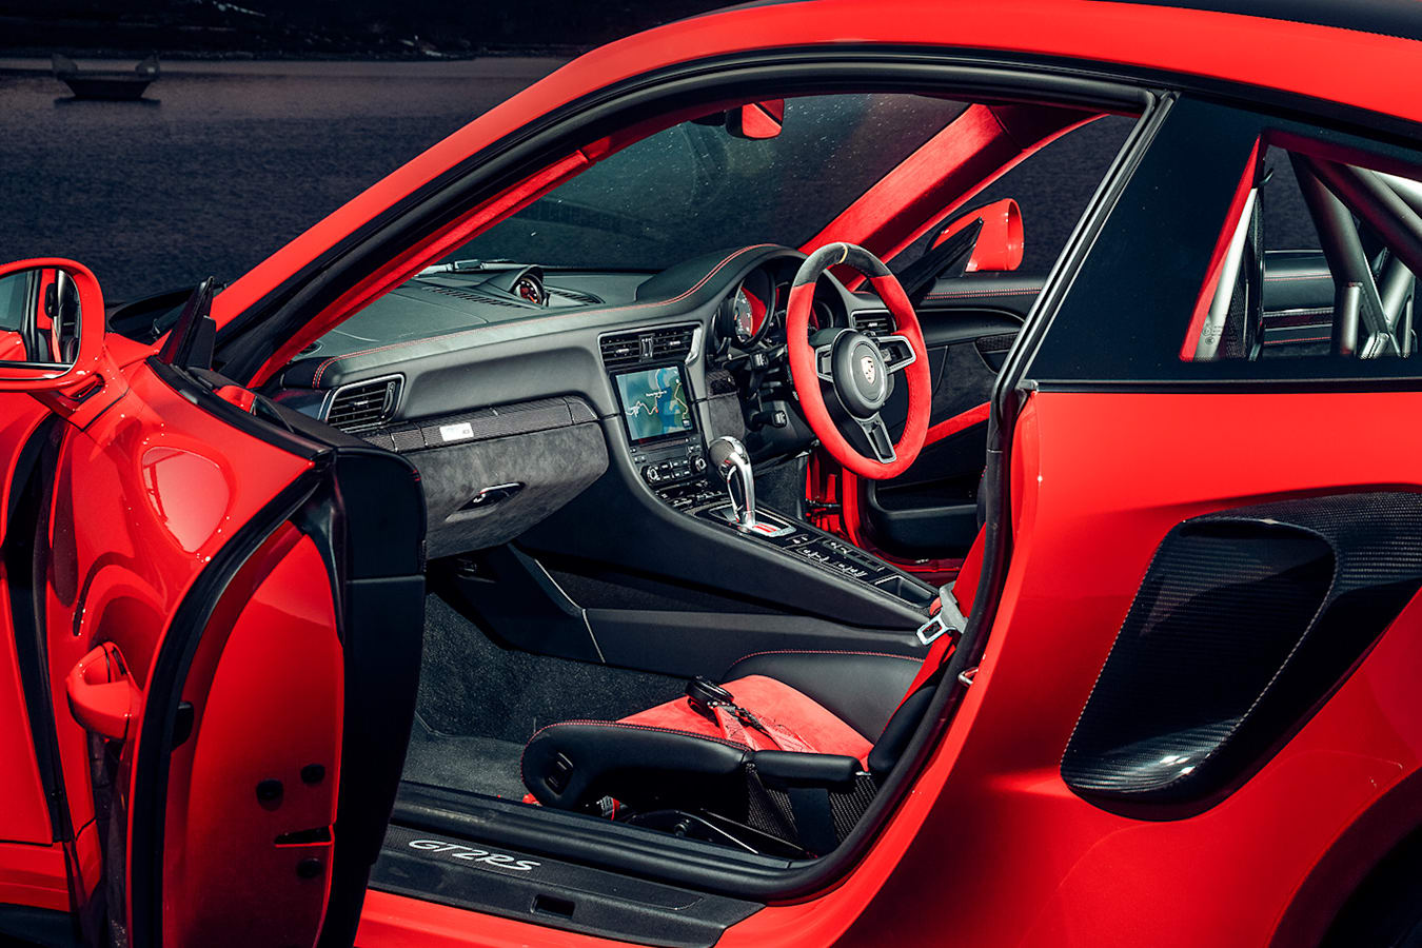 Porsche Gt 2 Rs Interior Jpg